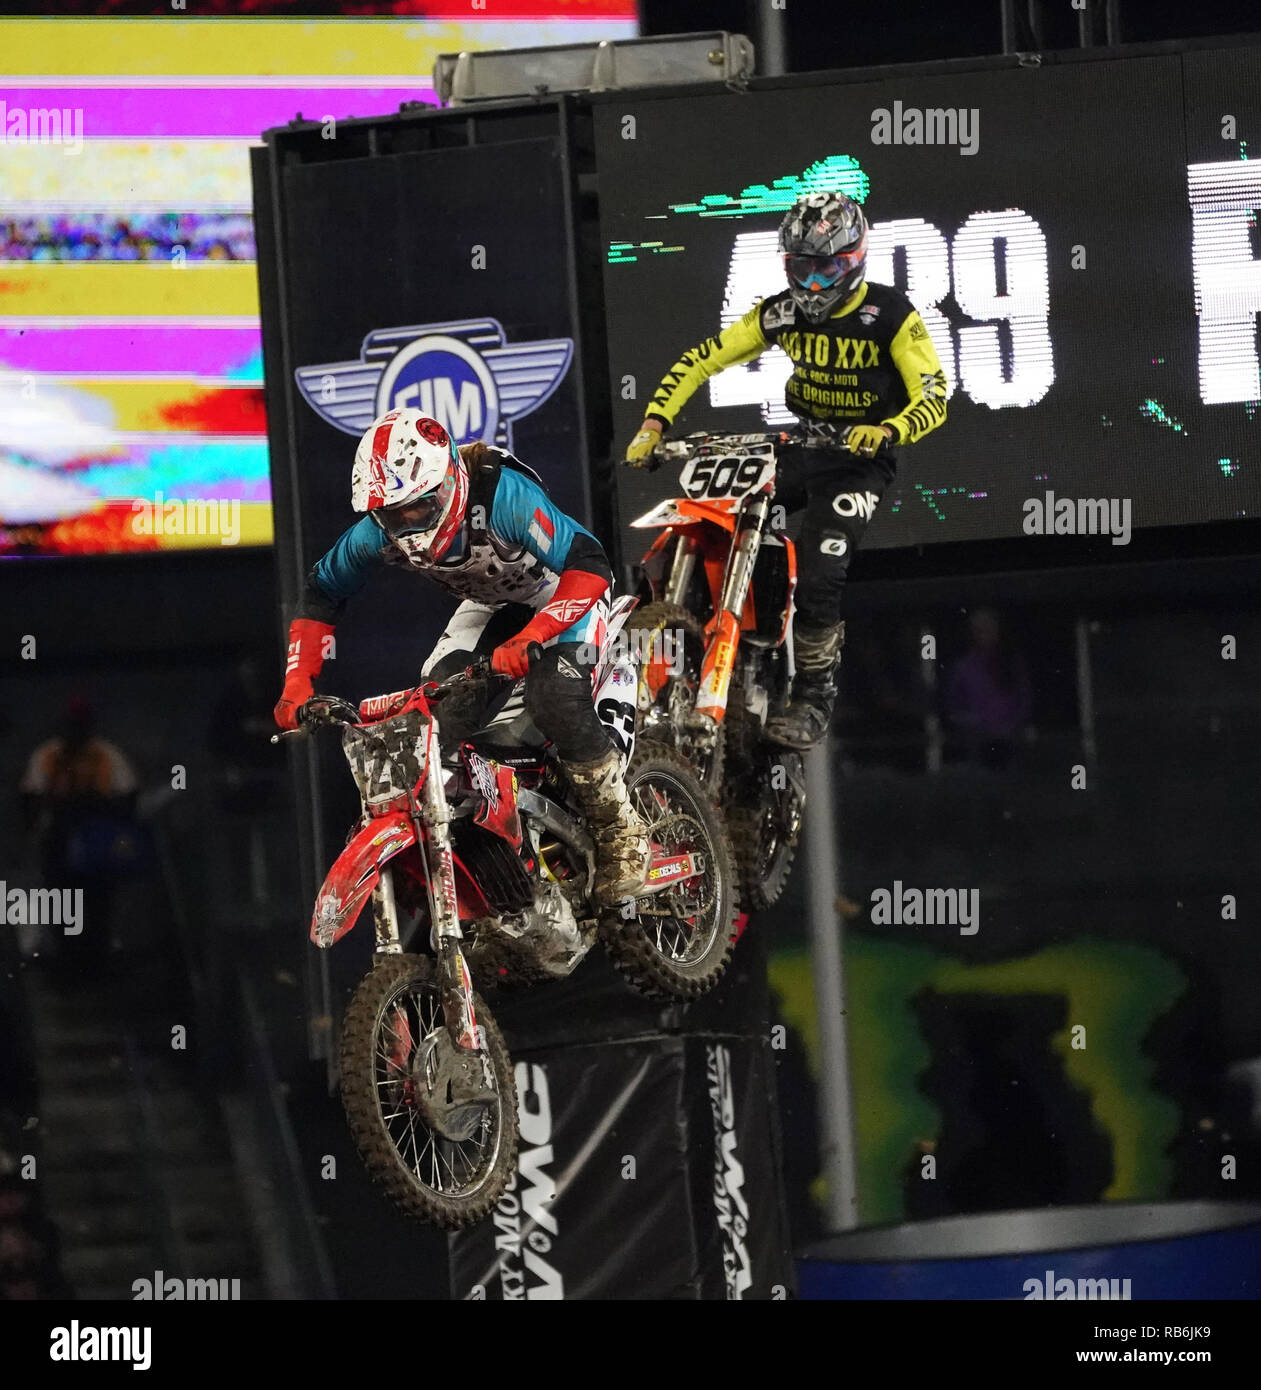 Anaheim, California, USA  1st Jan, 2017  AMA Supercross